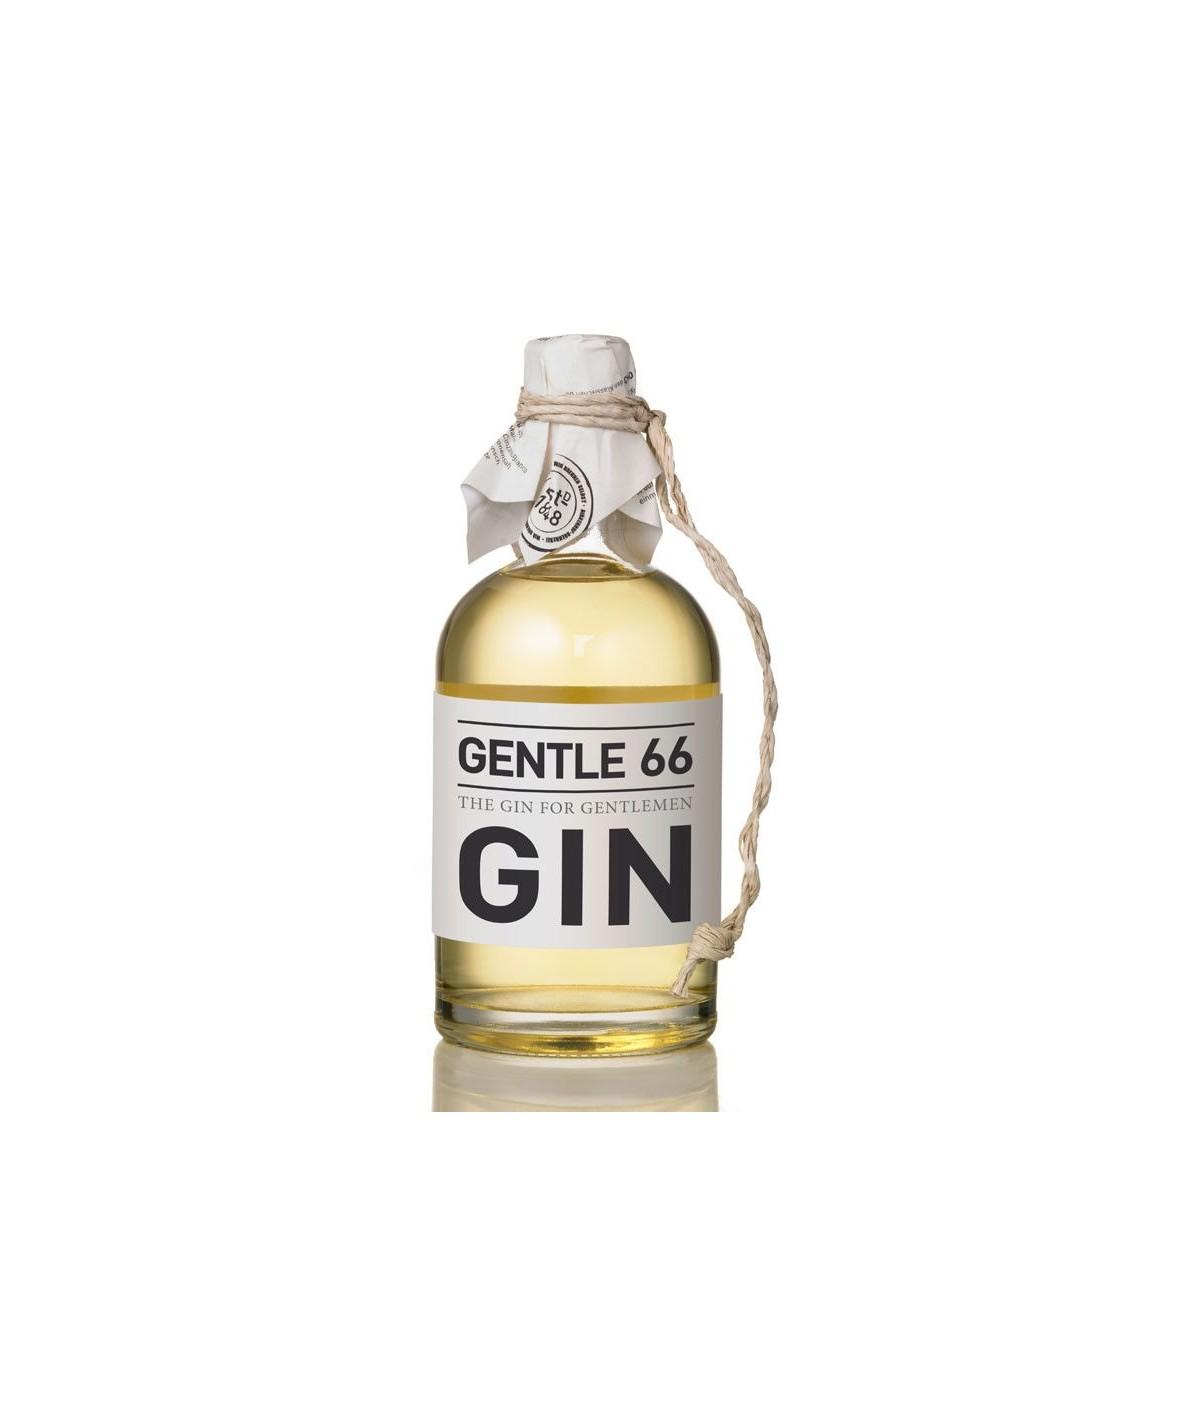 Gentle 66 Gin 0,5l